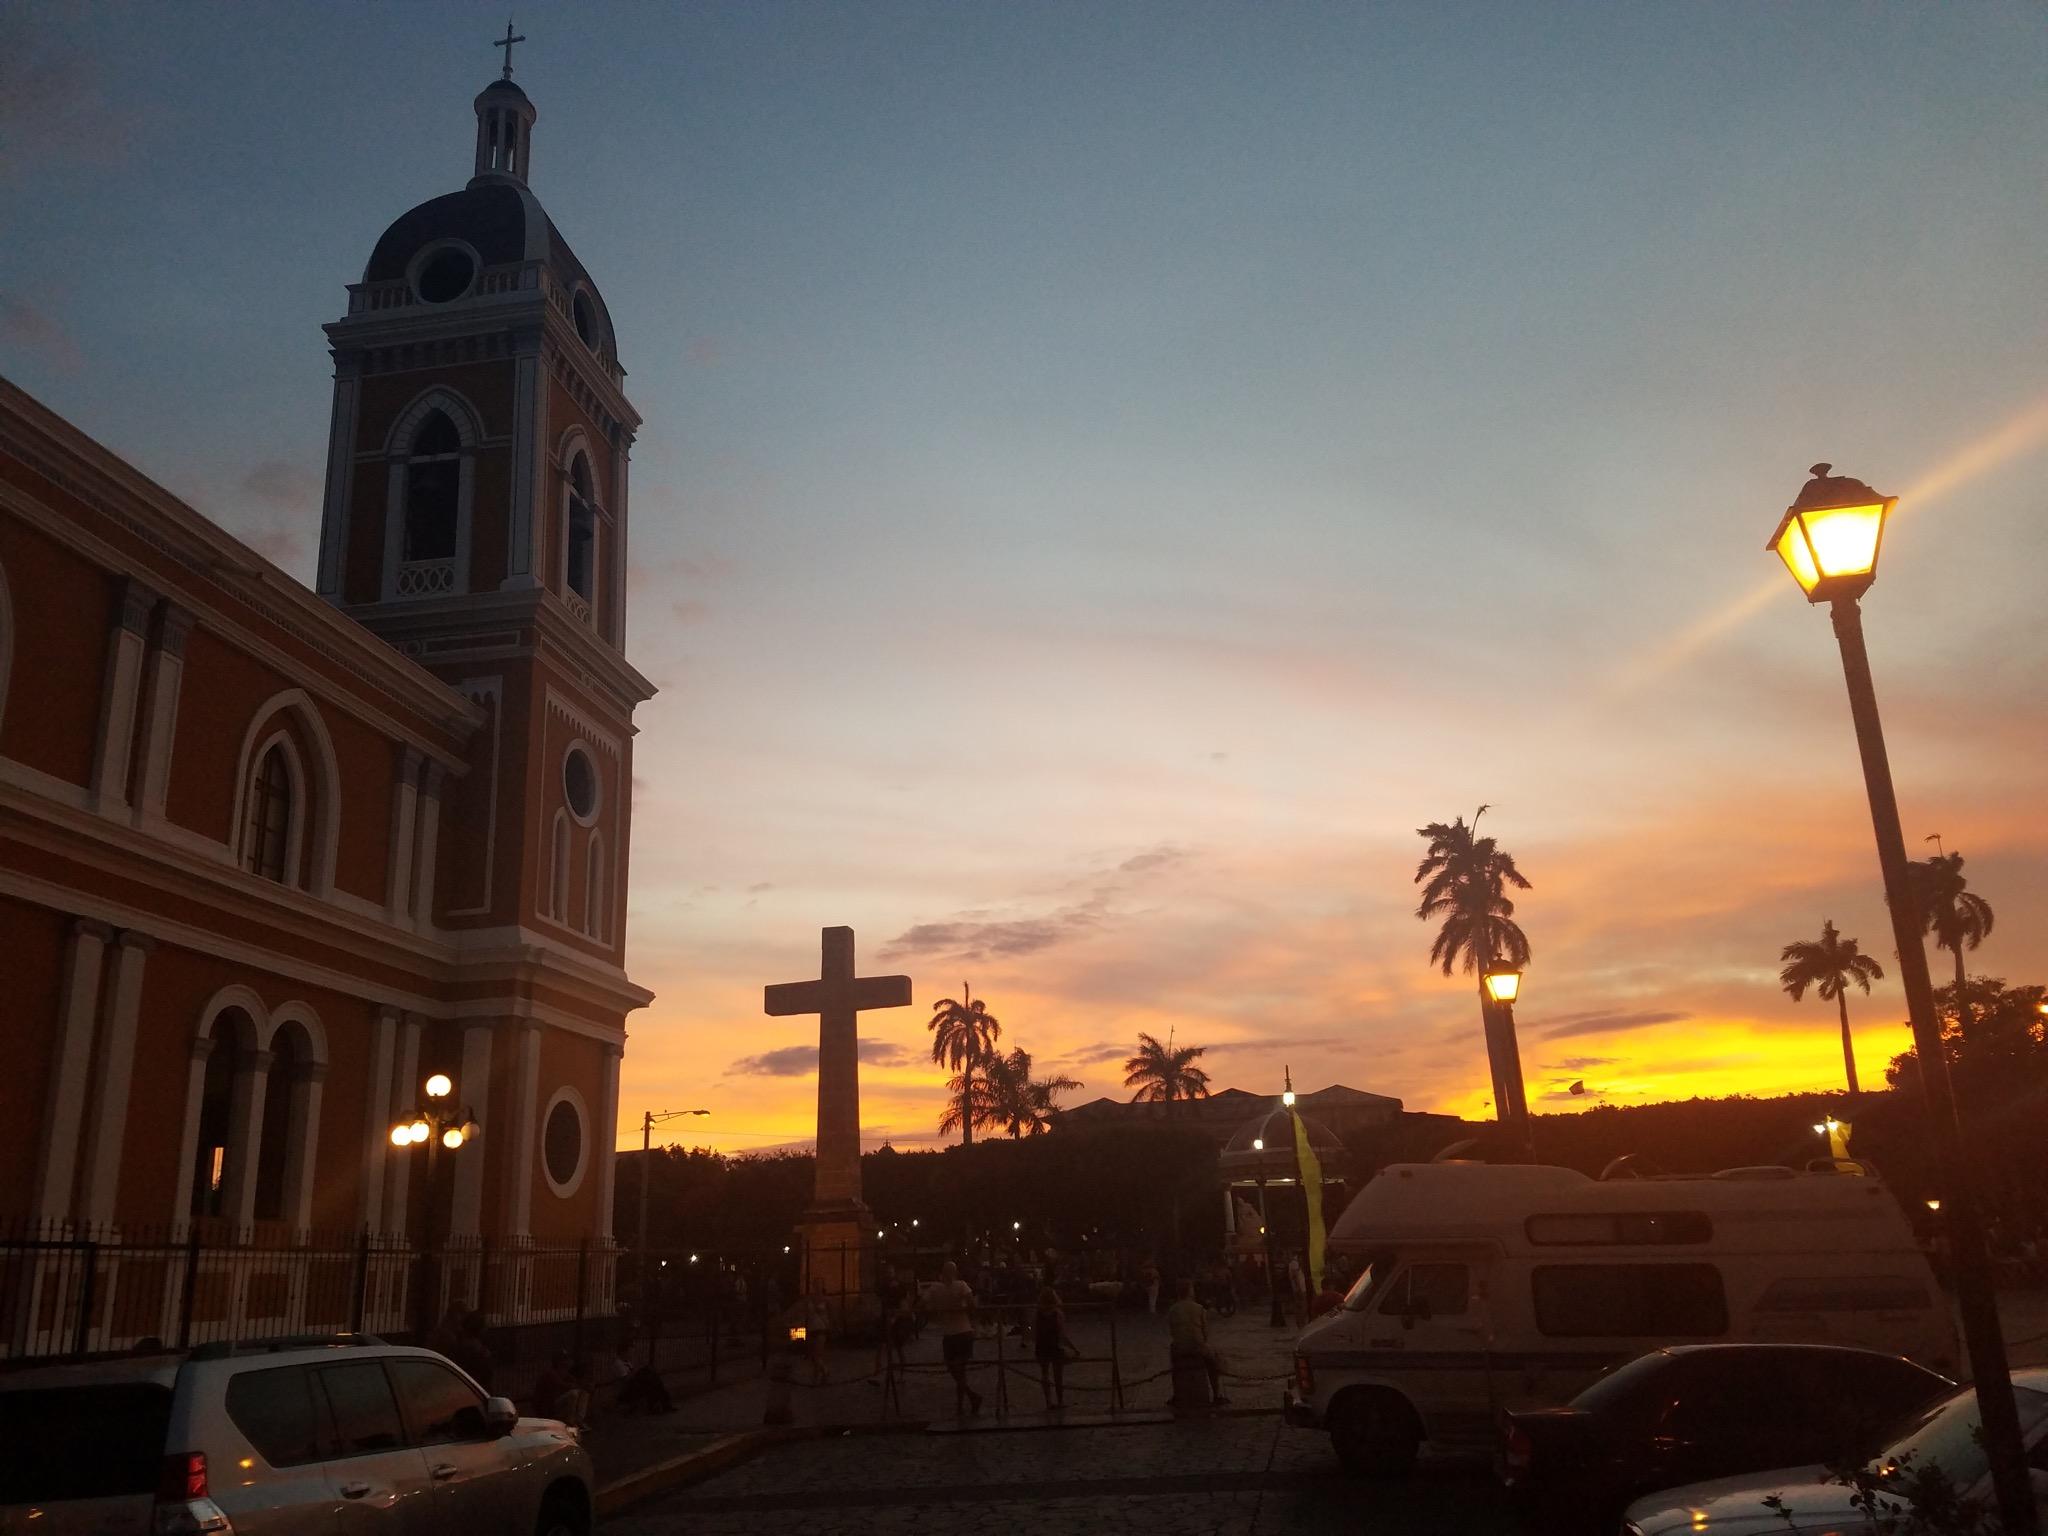 A Granada sunset.